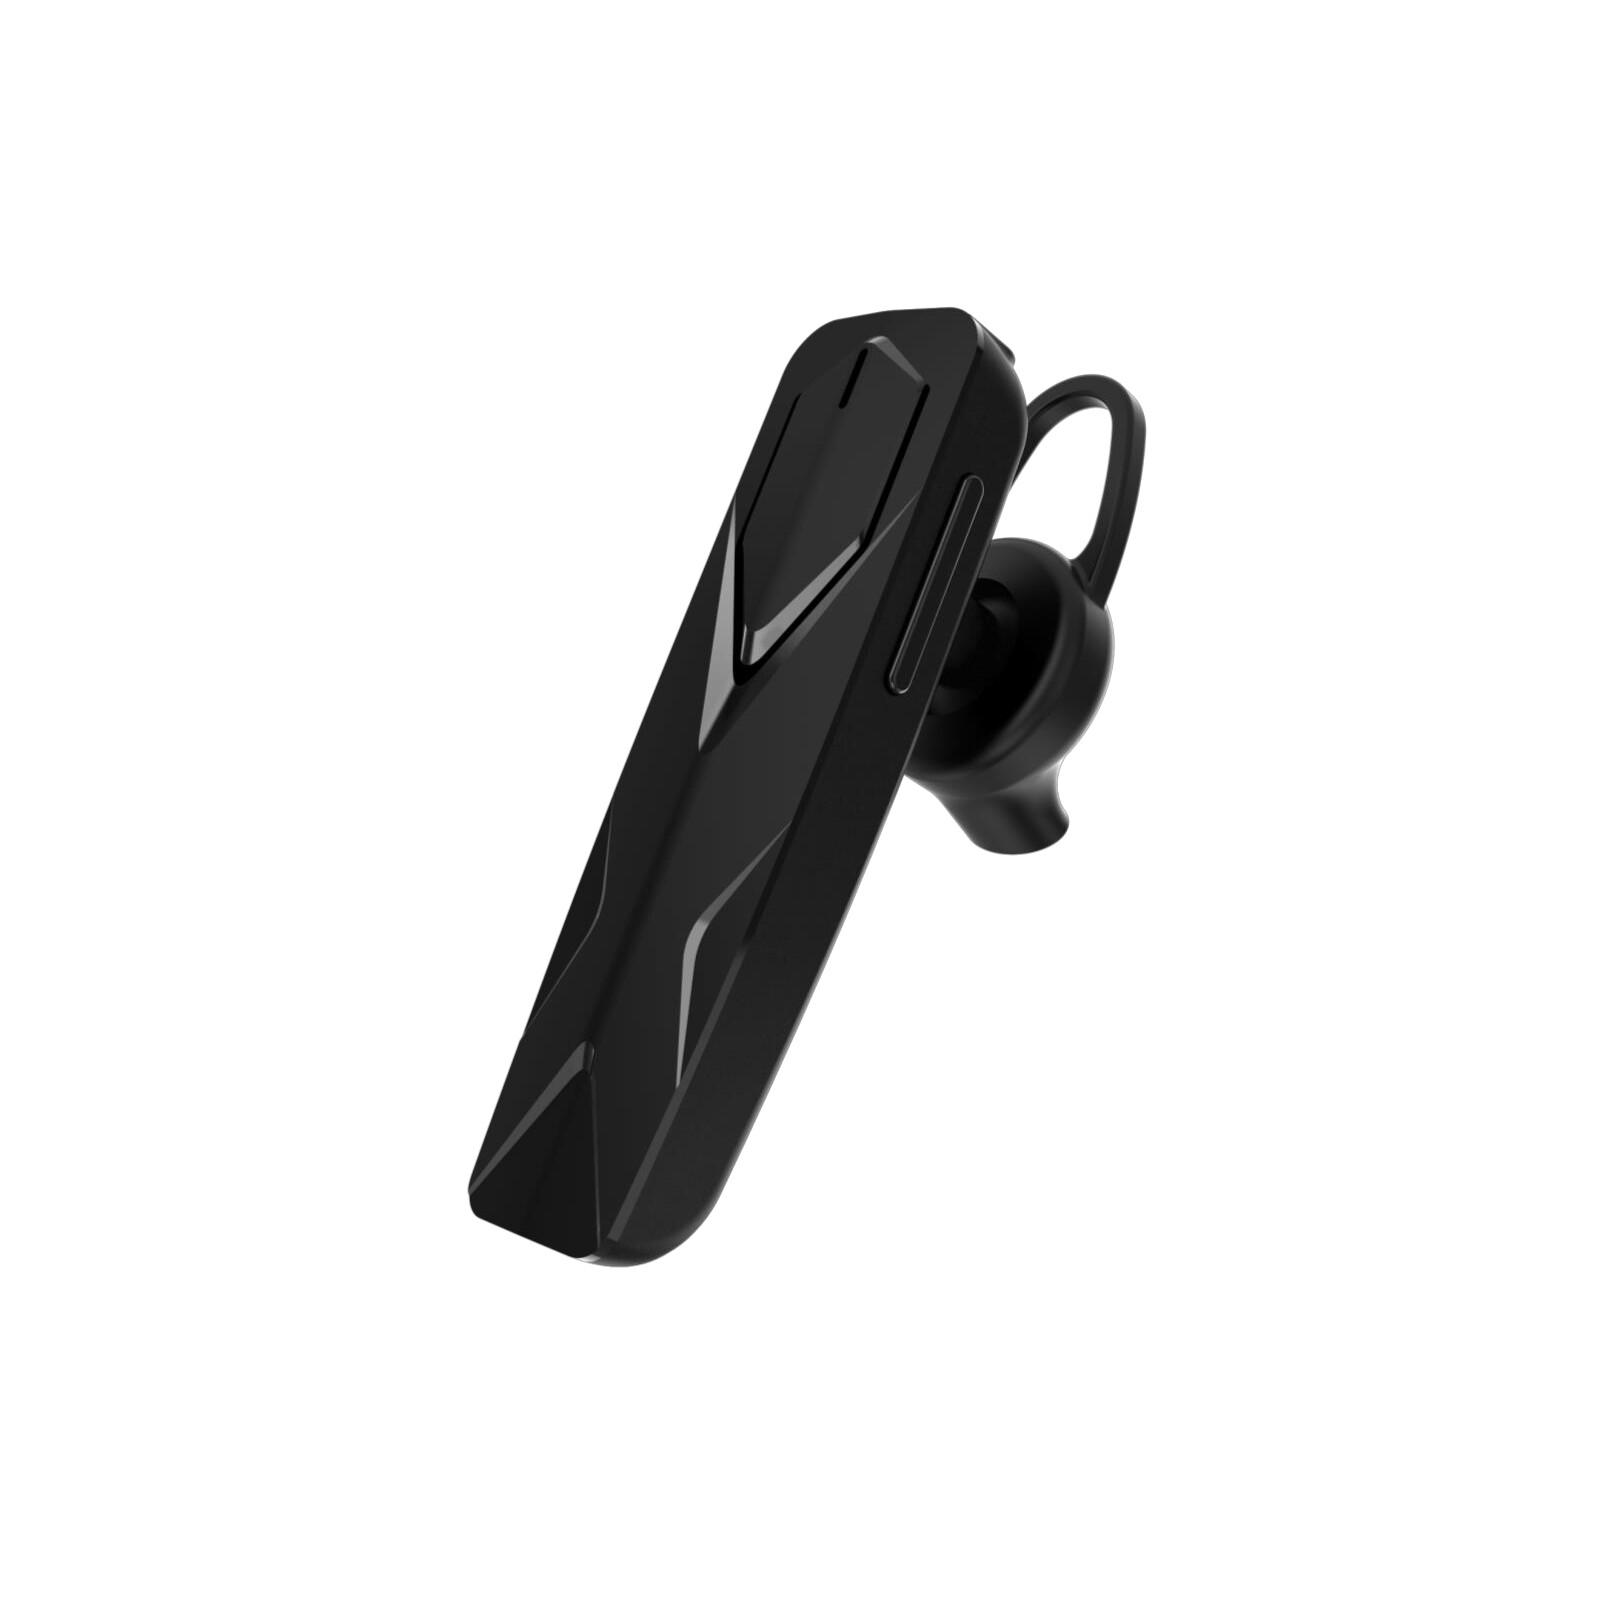 Felixx Premium Stereo In-Ear-Headset ARGON